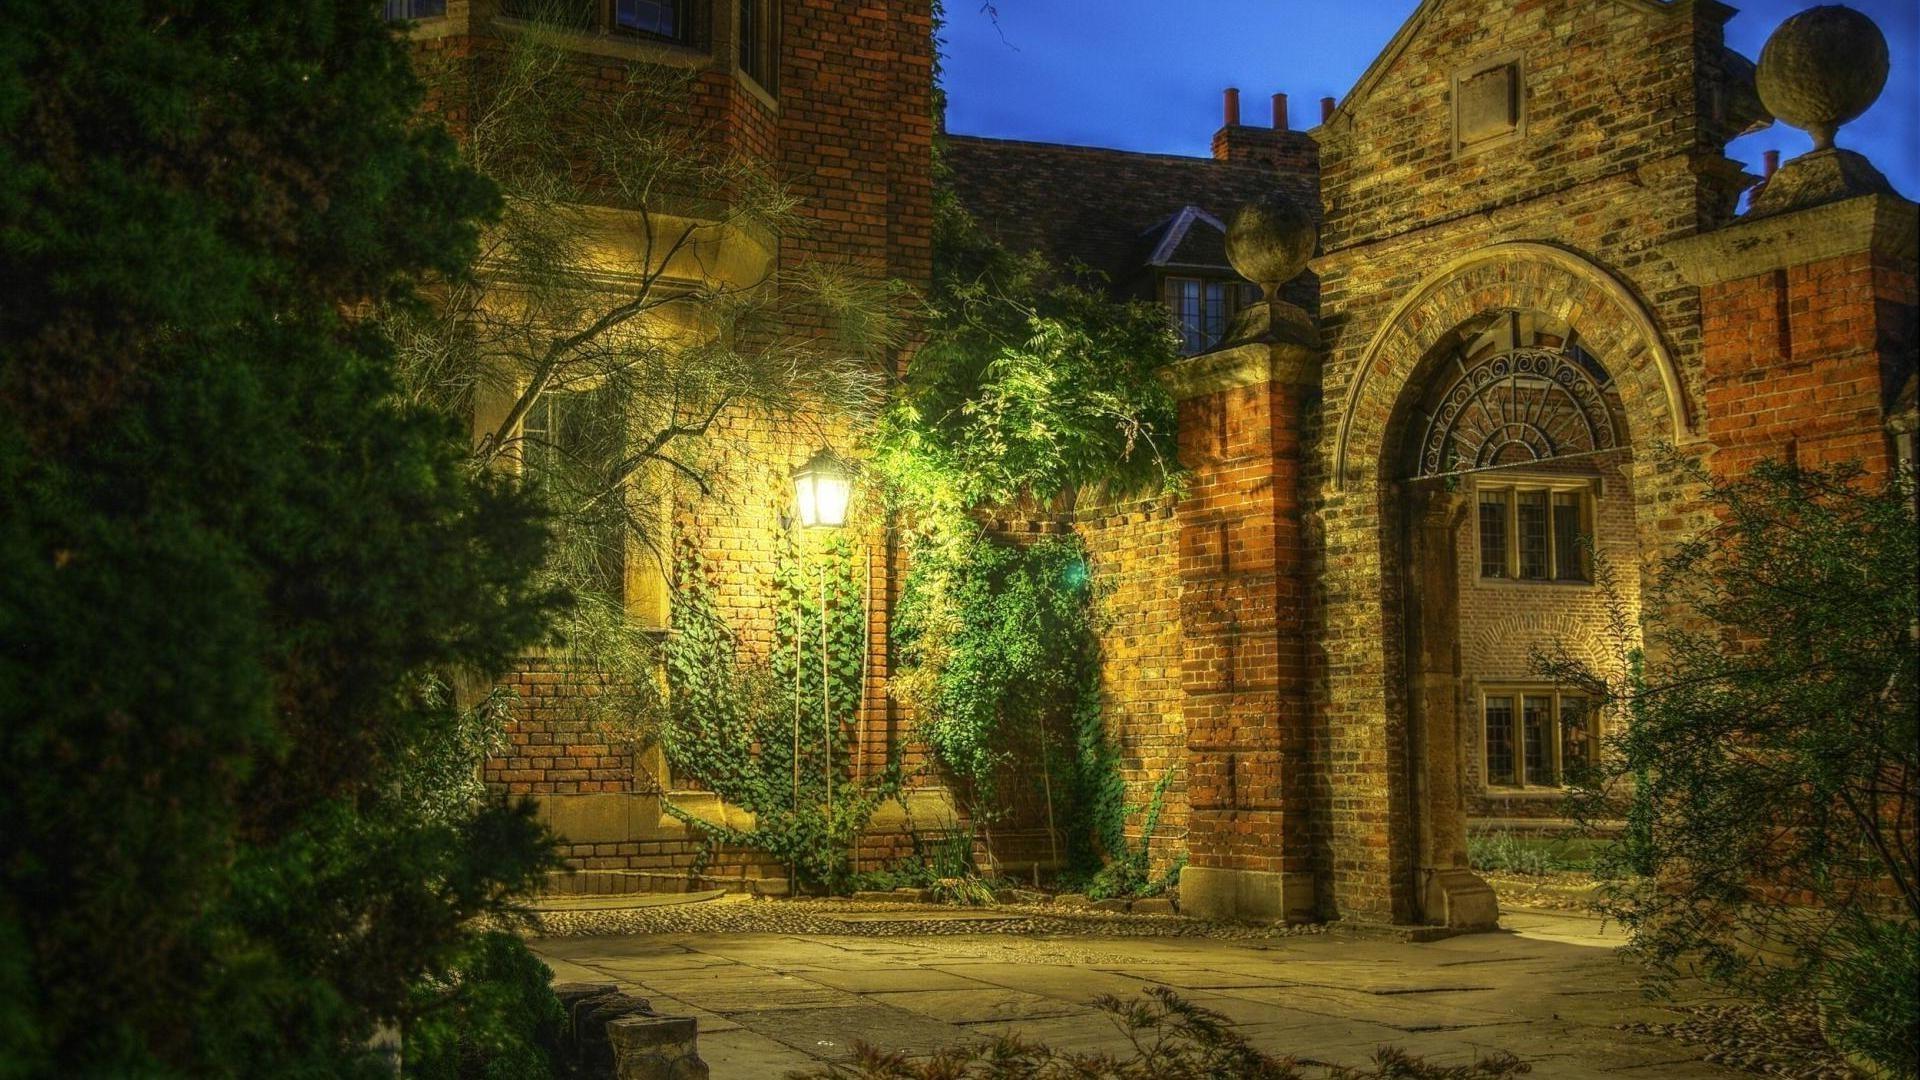 Ворота, Англия бесплатно